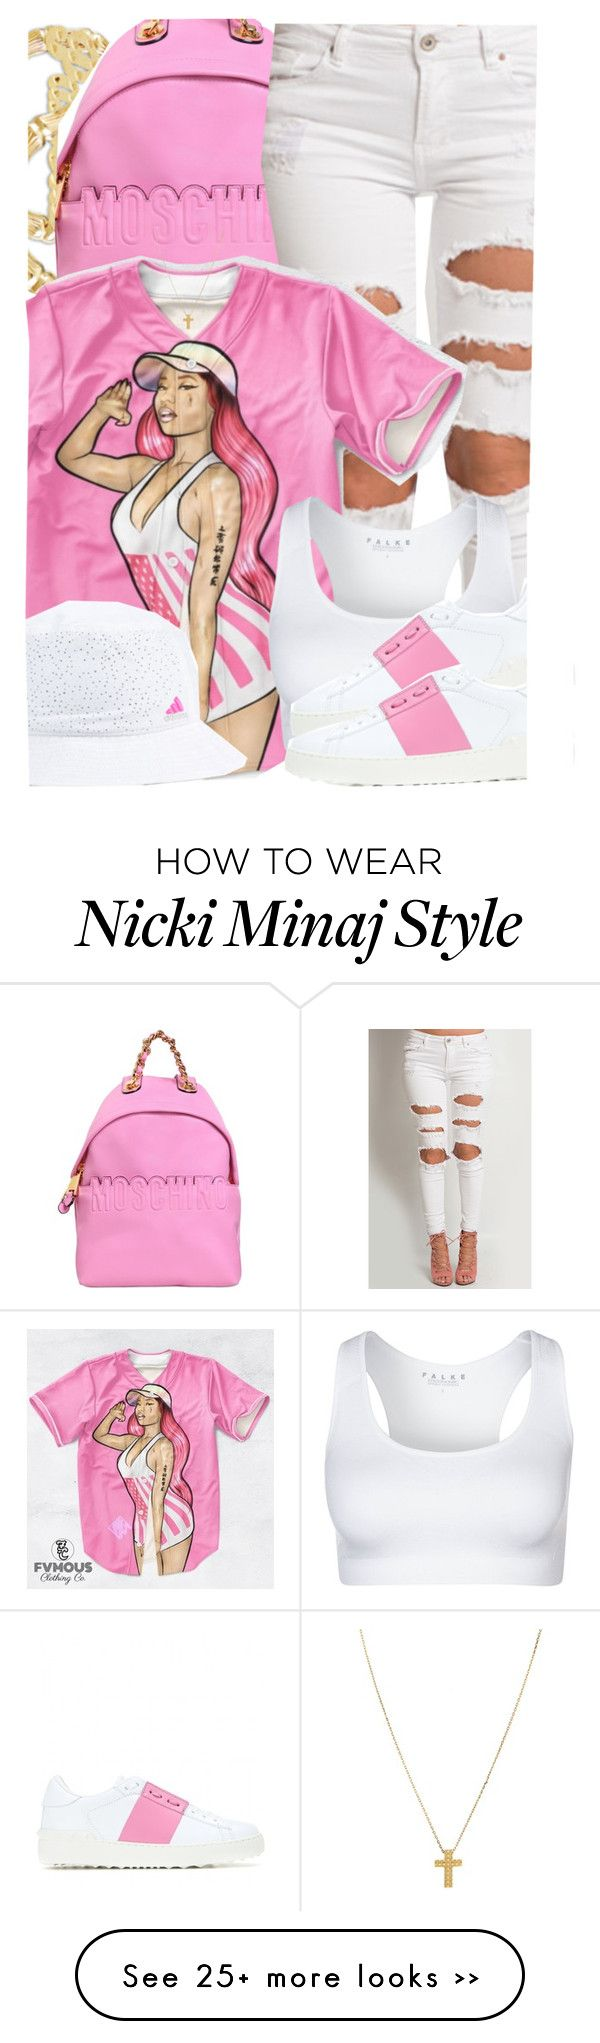 """6-25-15 nicki minaj this no competition, its a fashion show aint no winners #duh"" by no-flex-zone on Polyvore"